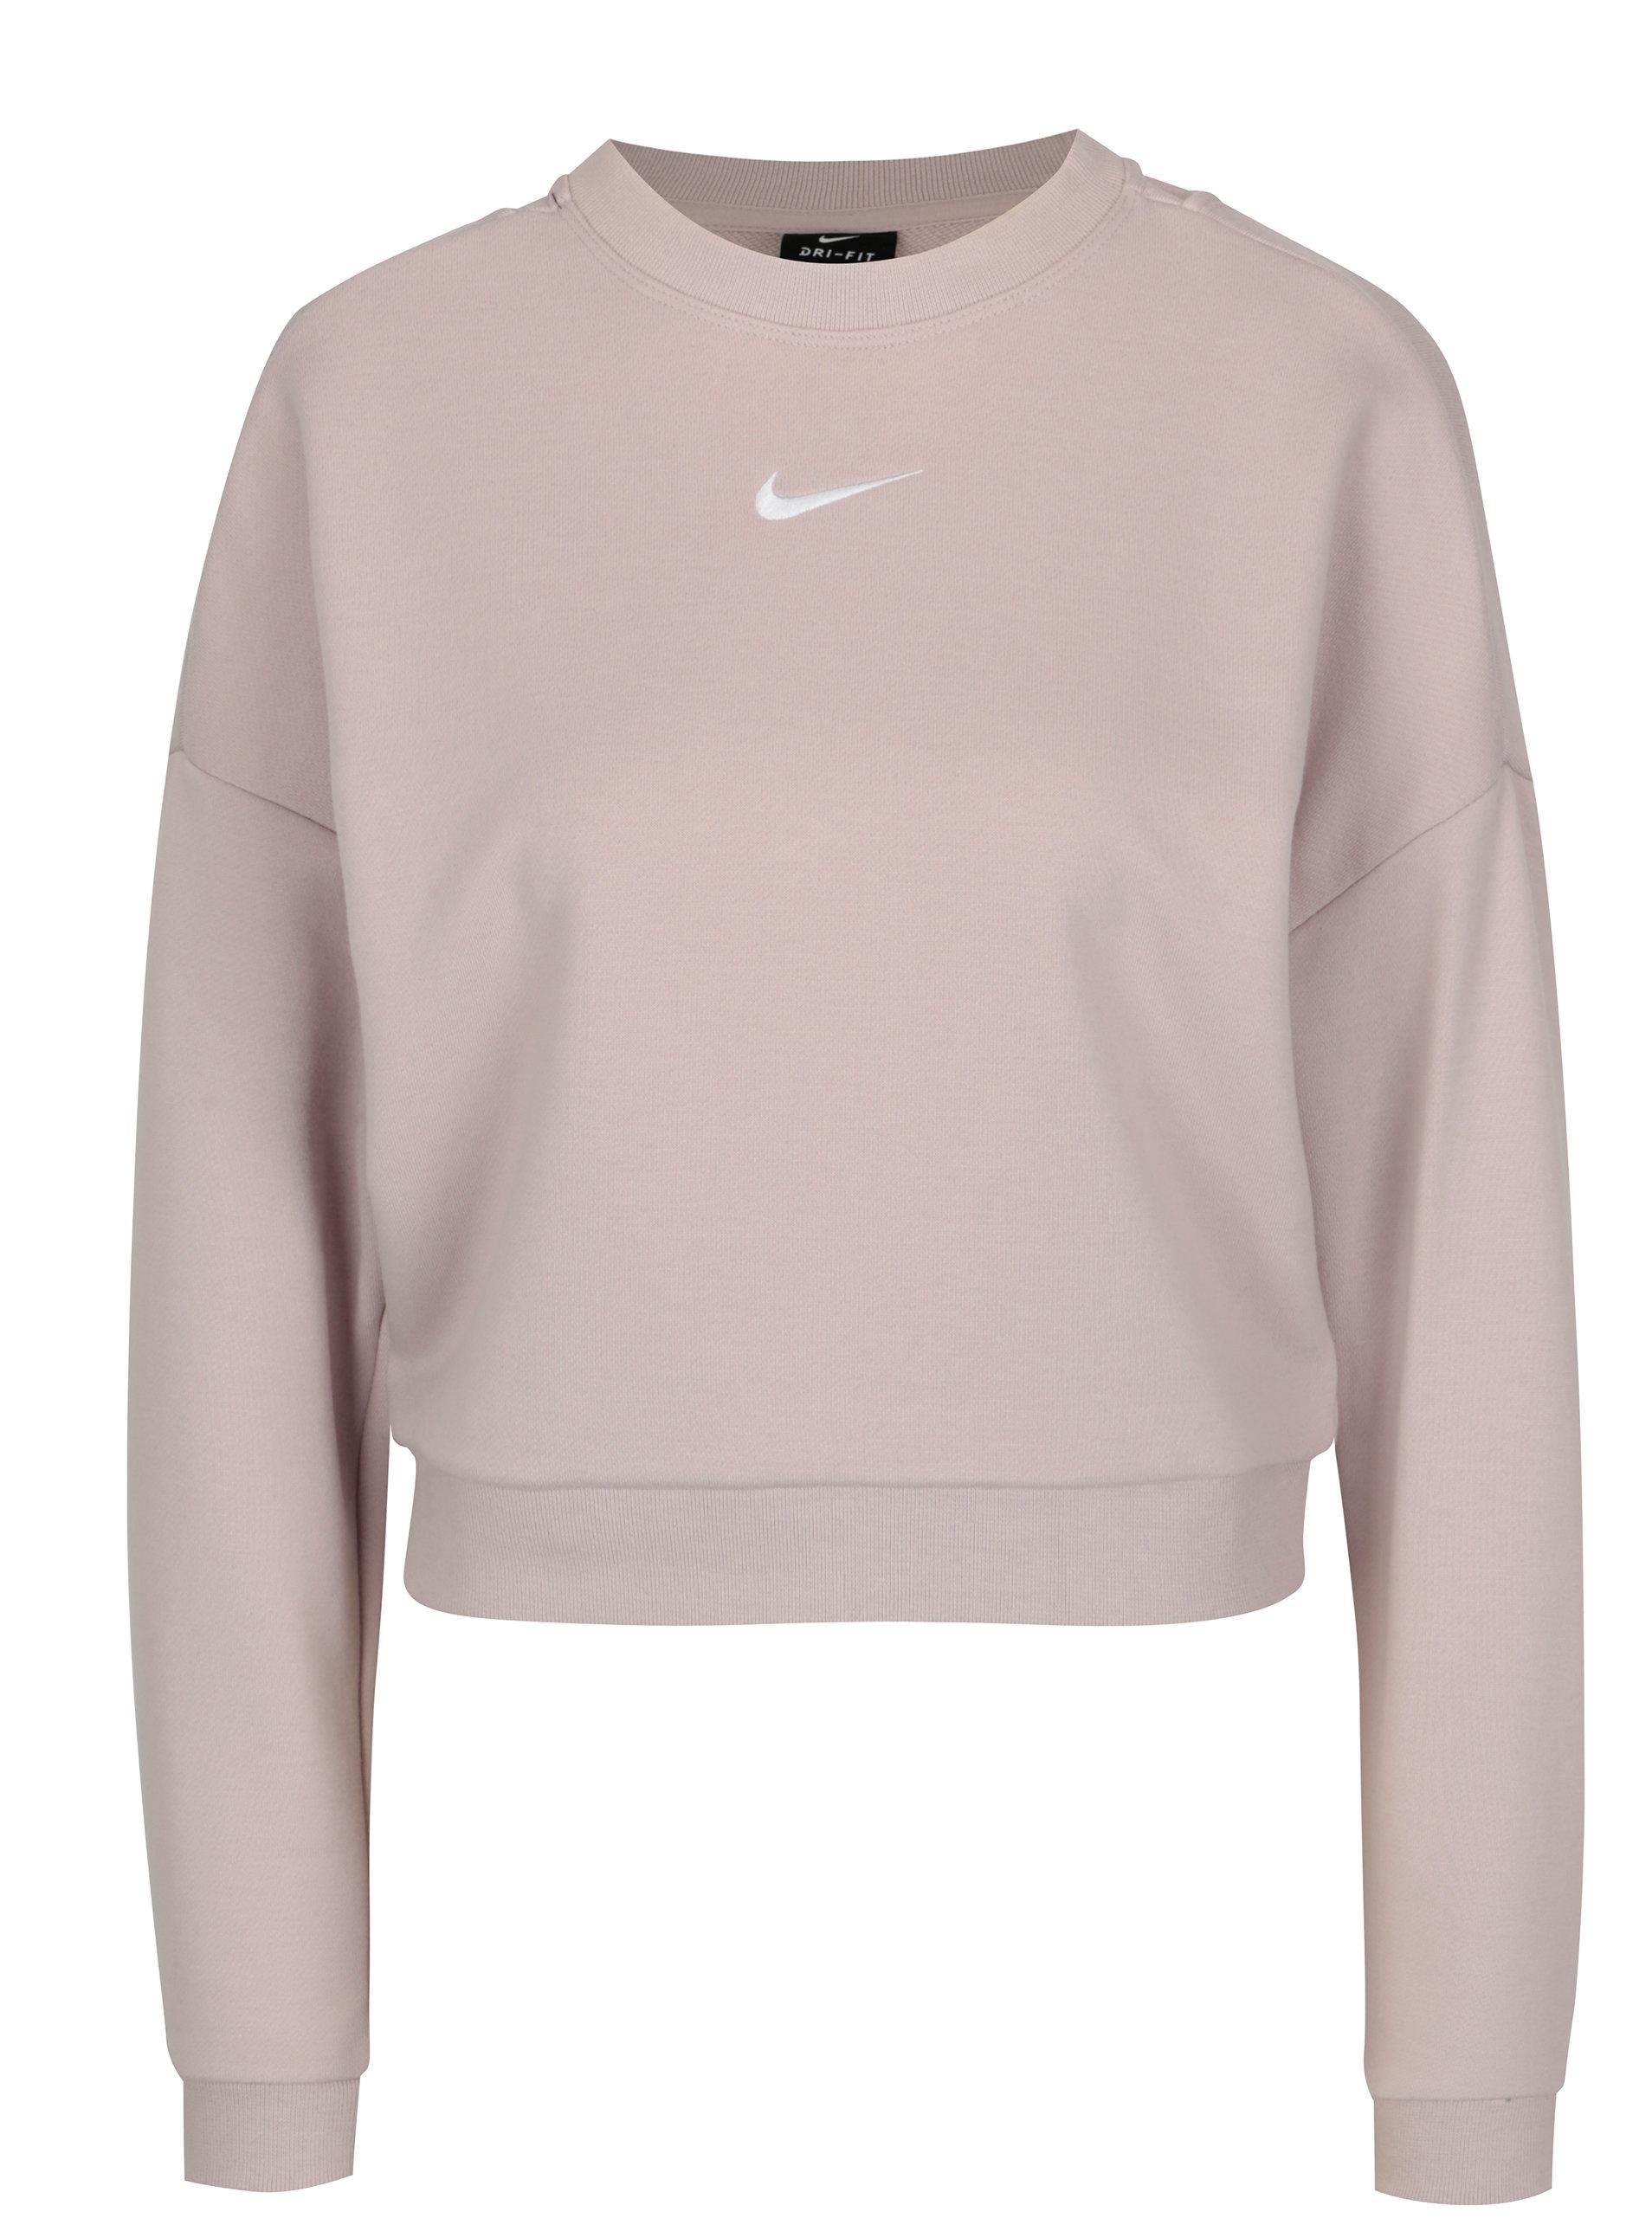 7478957f7078 Ružová dámska funkčná crop mikina Nike CREWNECK CROP ...